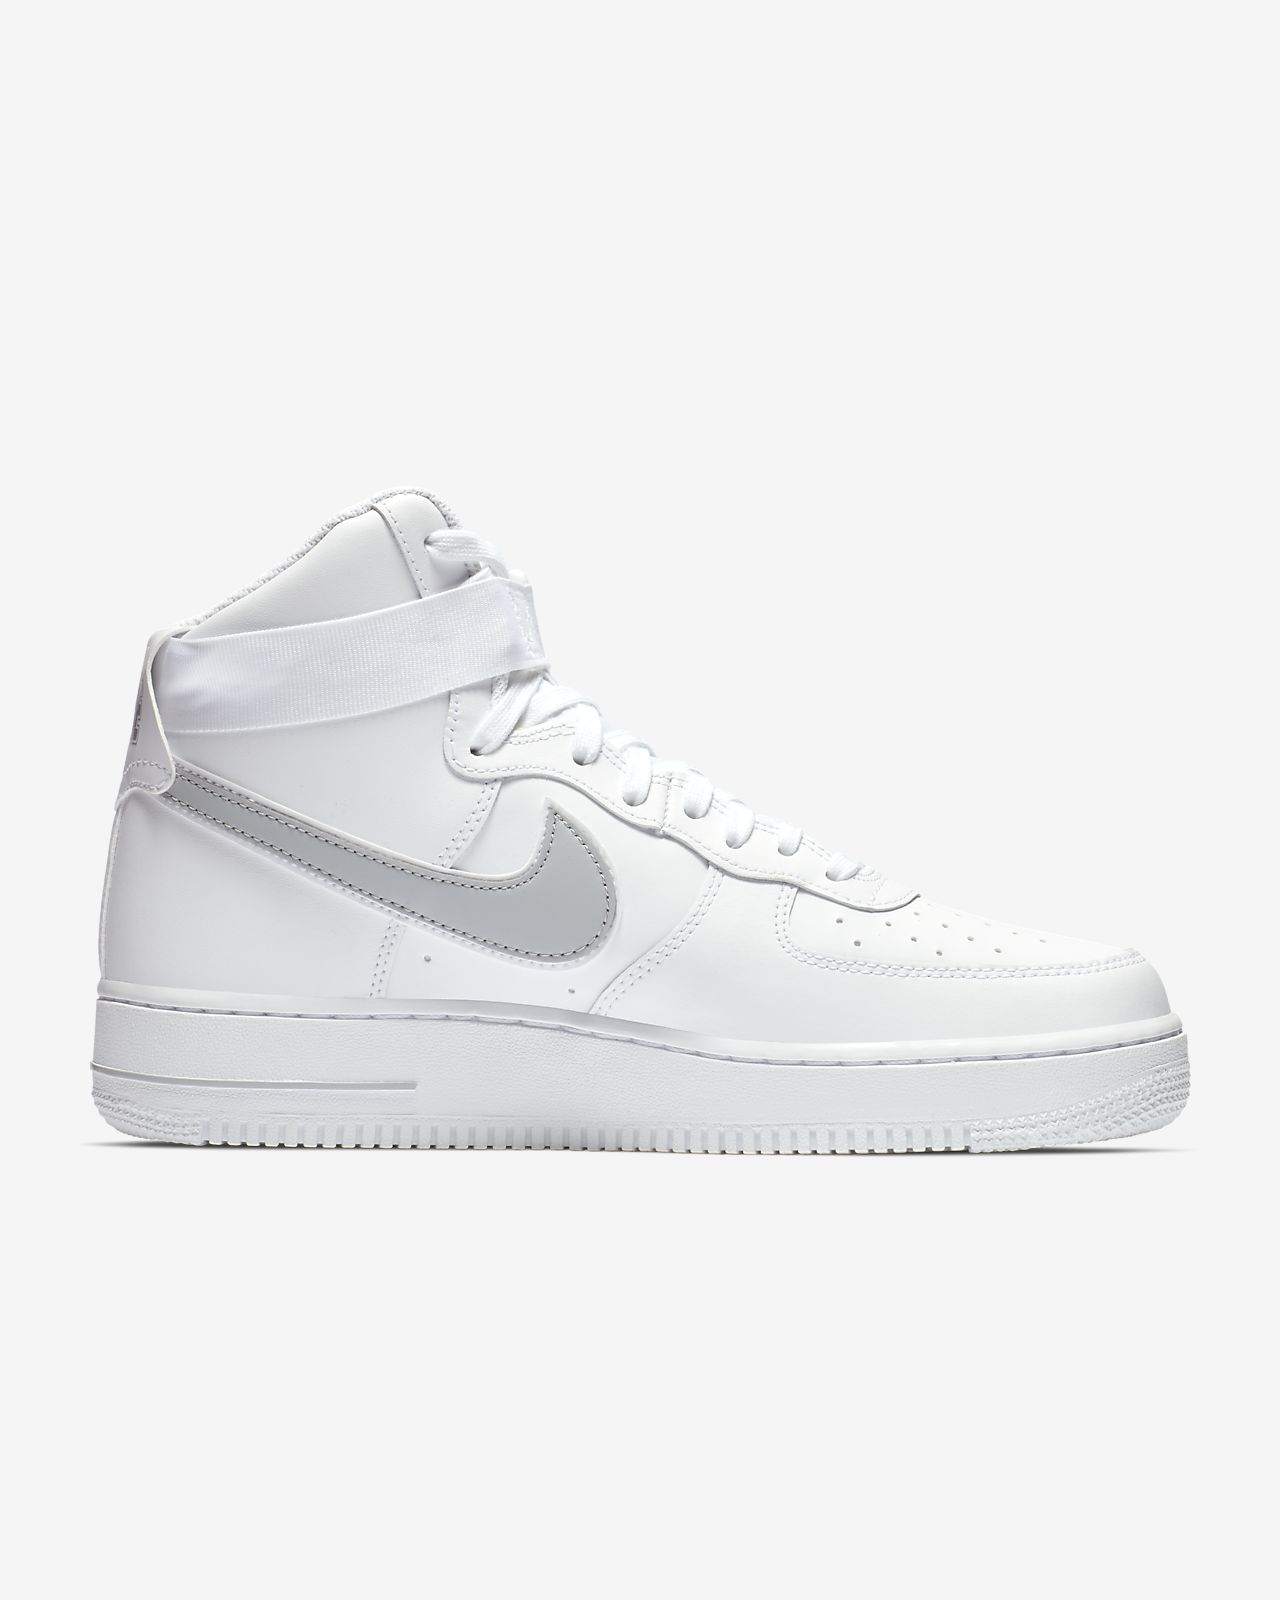 Nike AO2423 100 Air Force 1 07 Herren Lebensstil Schuh WeißBlau